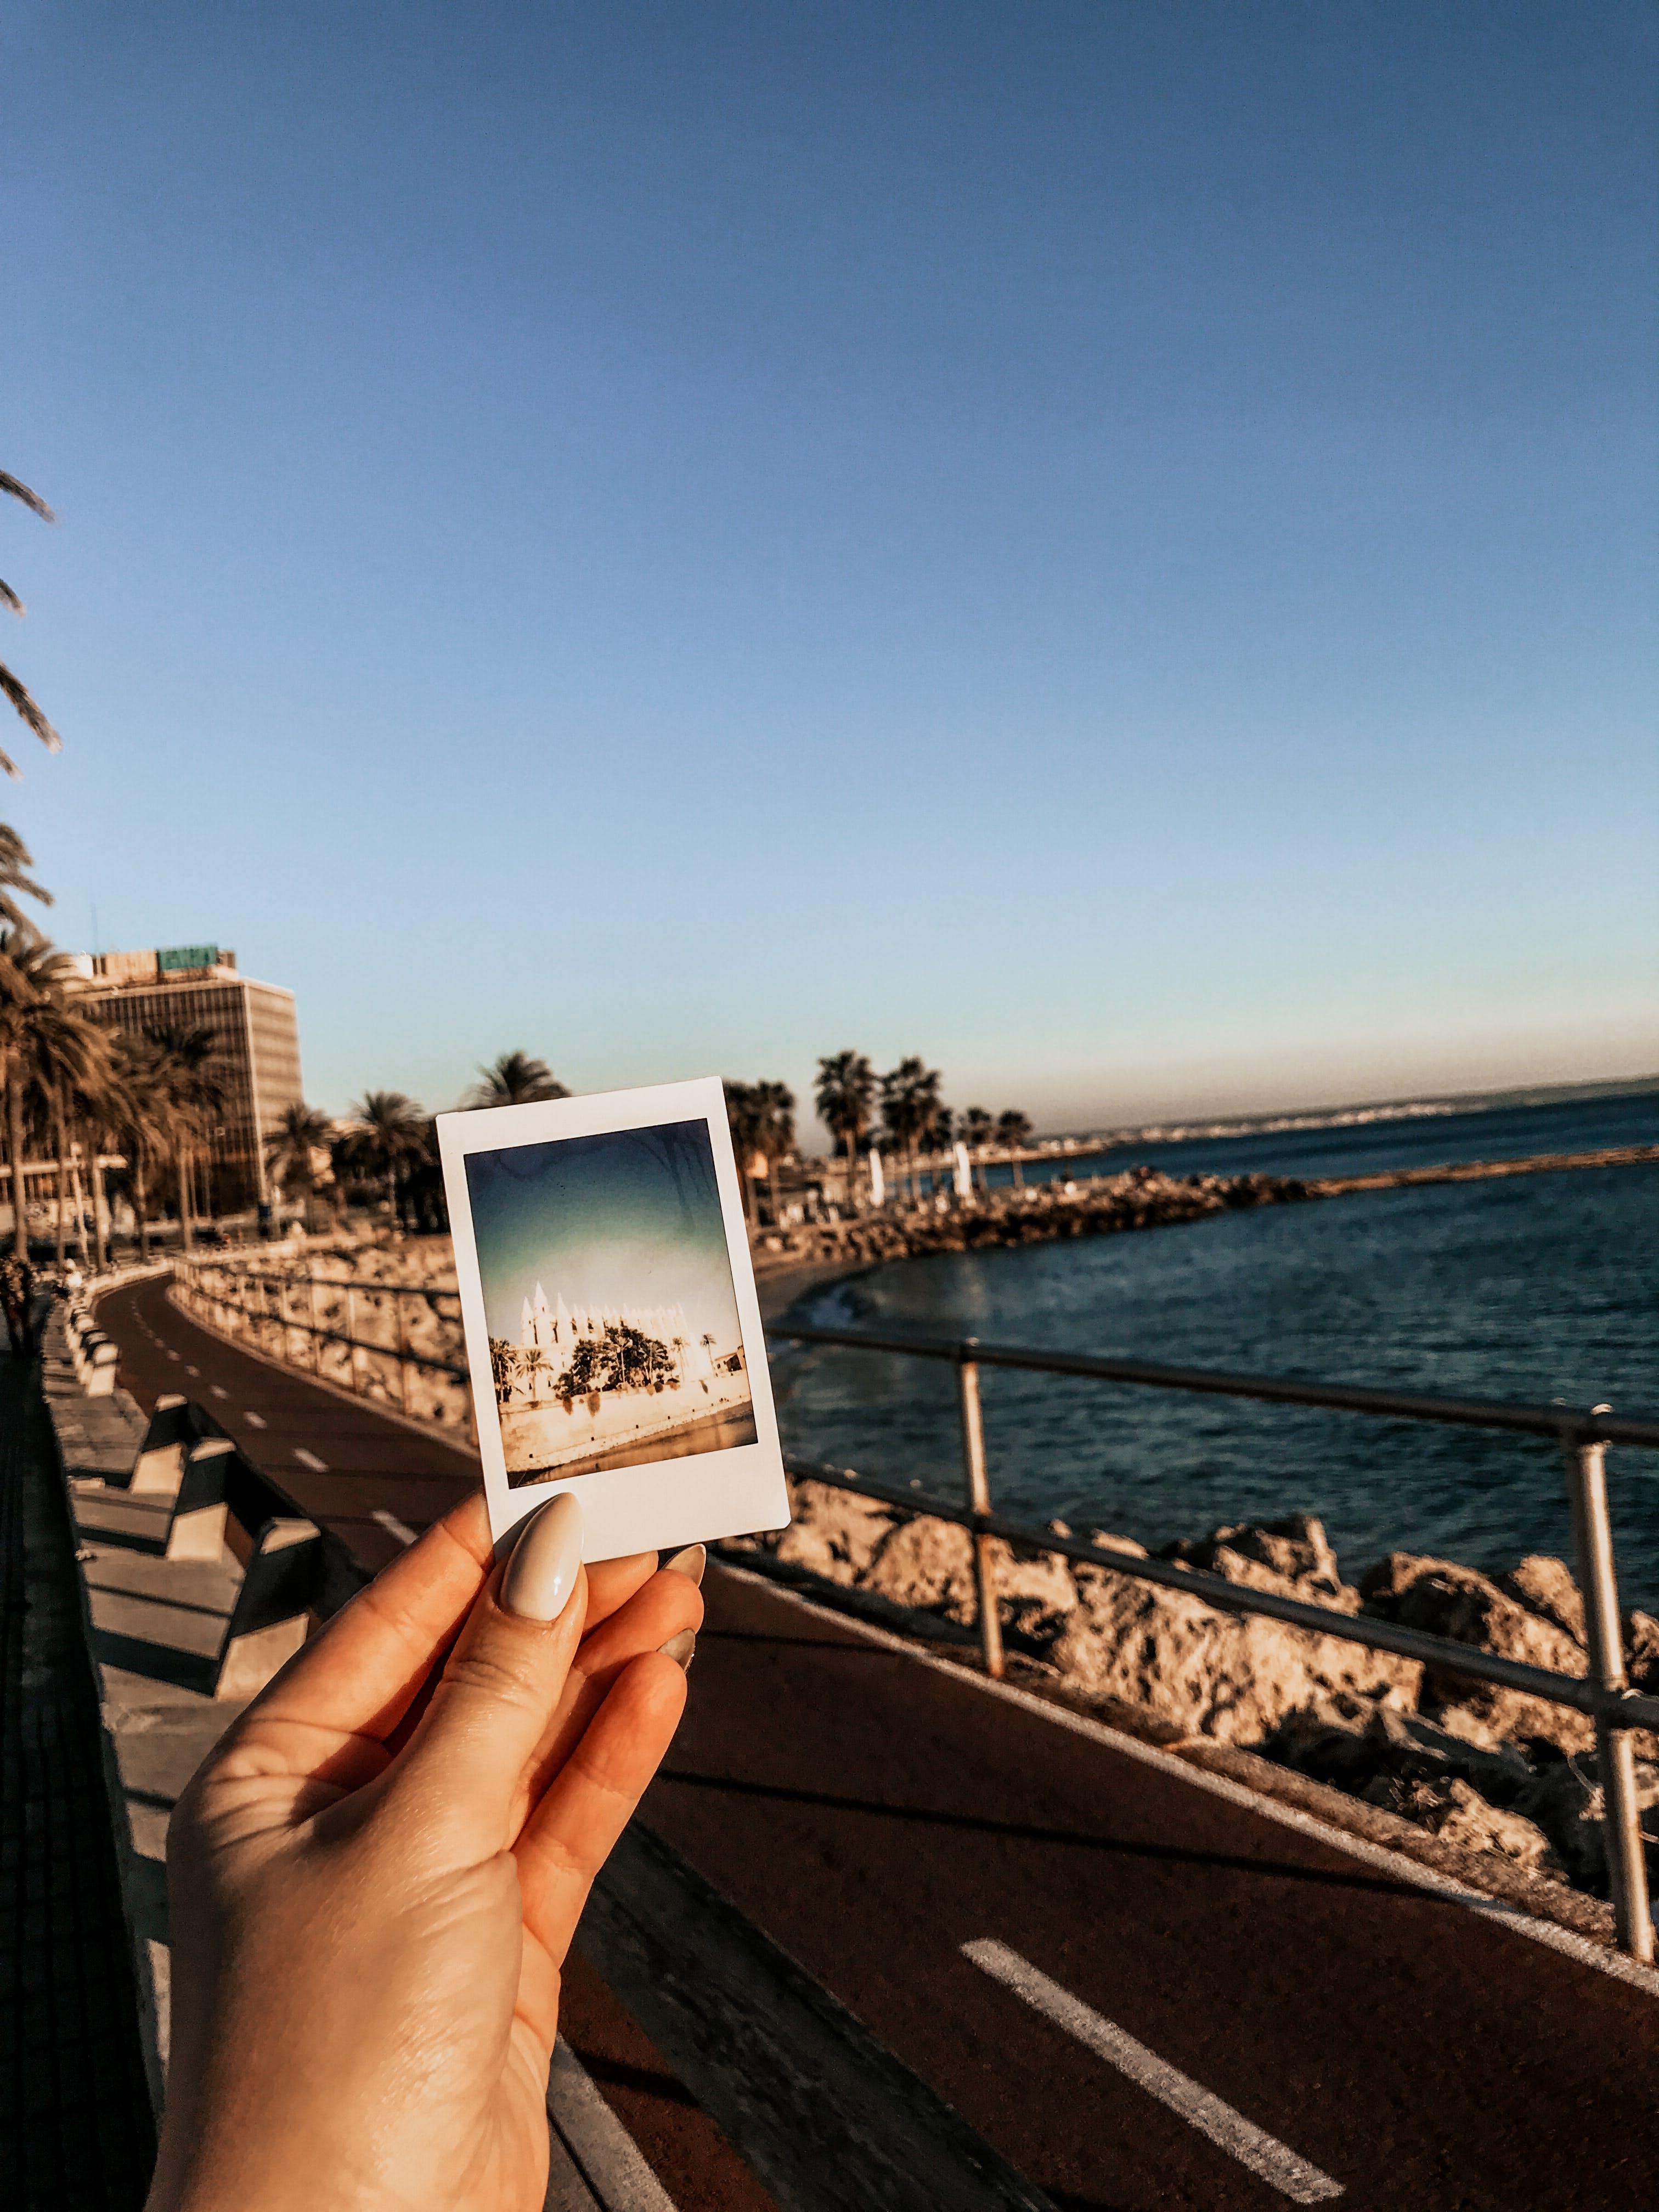 Kostenloses Stock Foto zu bild, foto, hand, polaroid